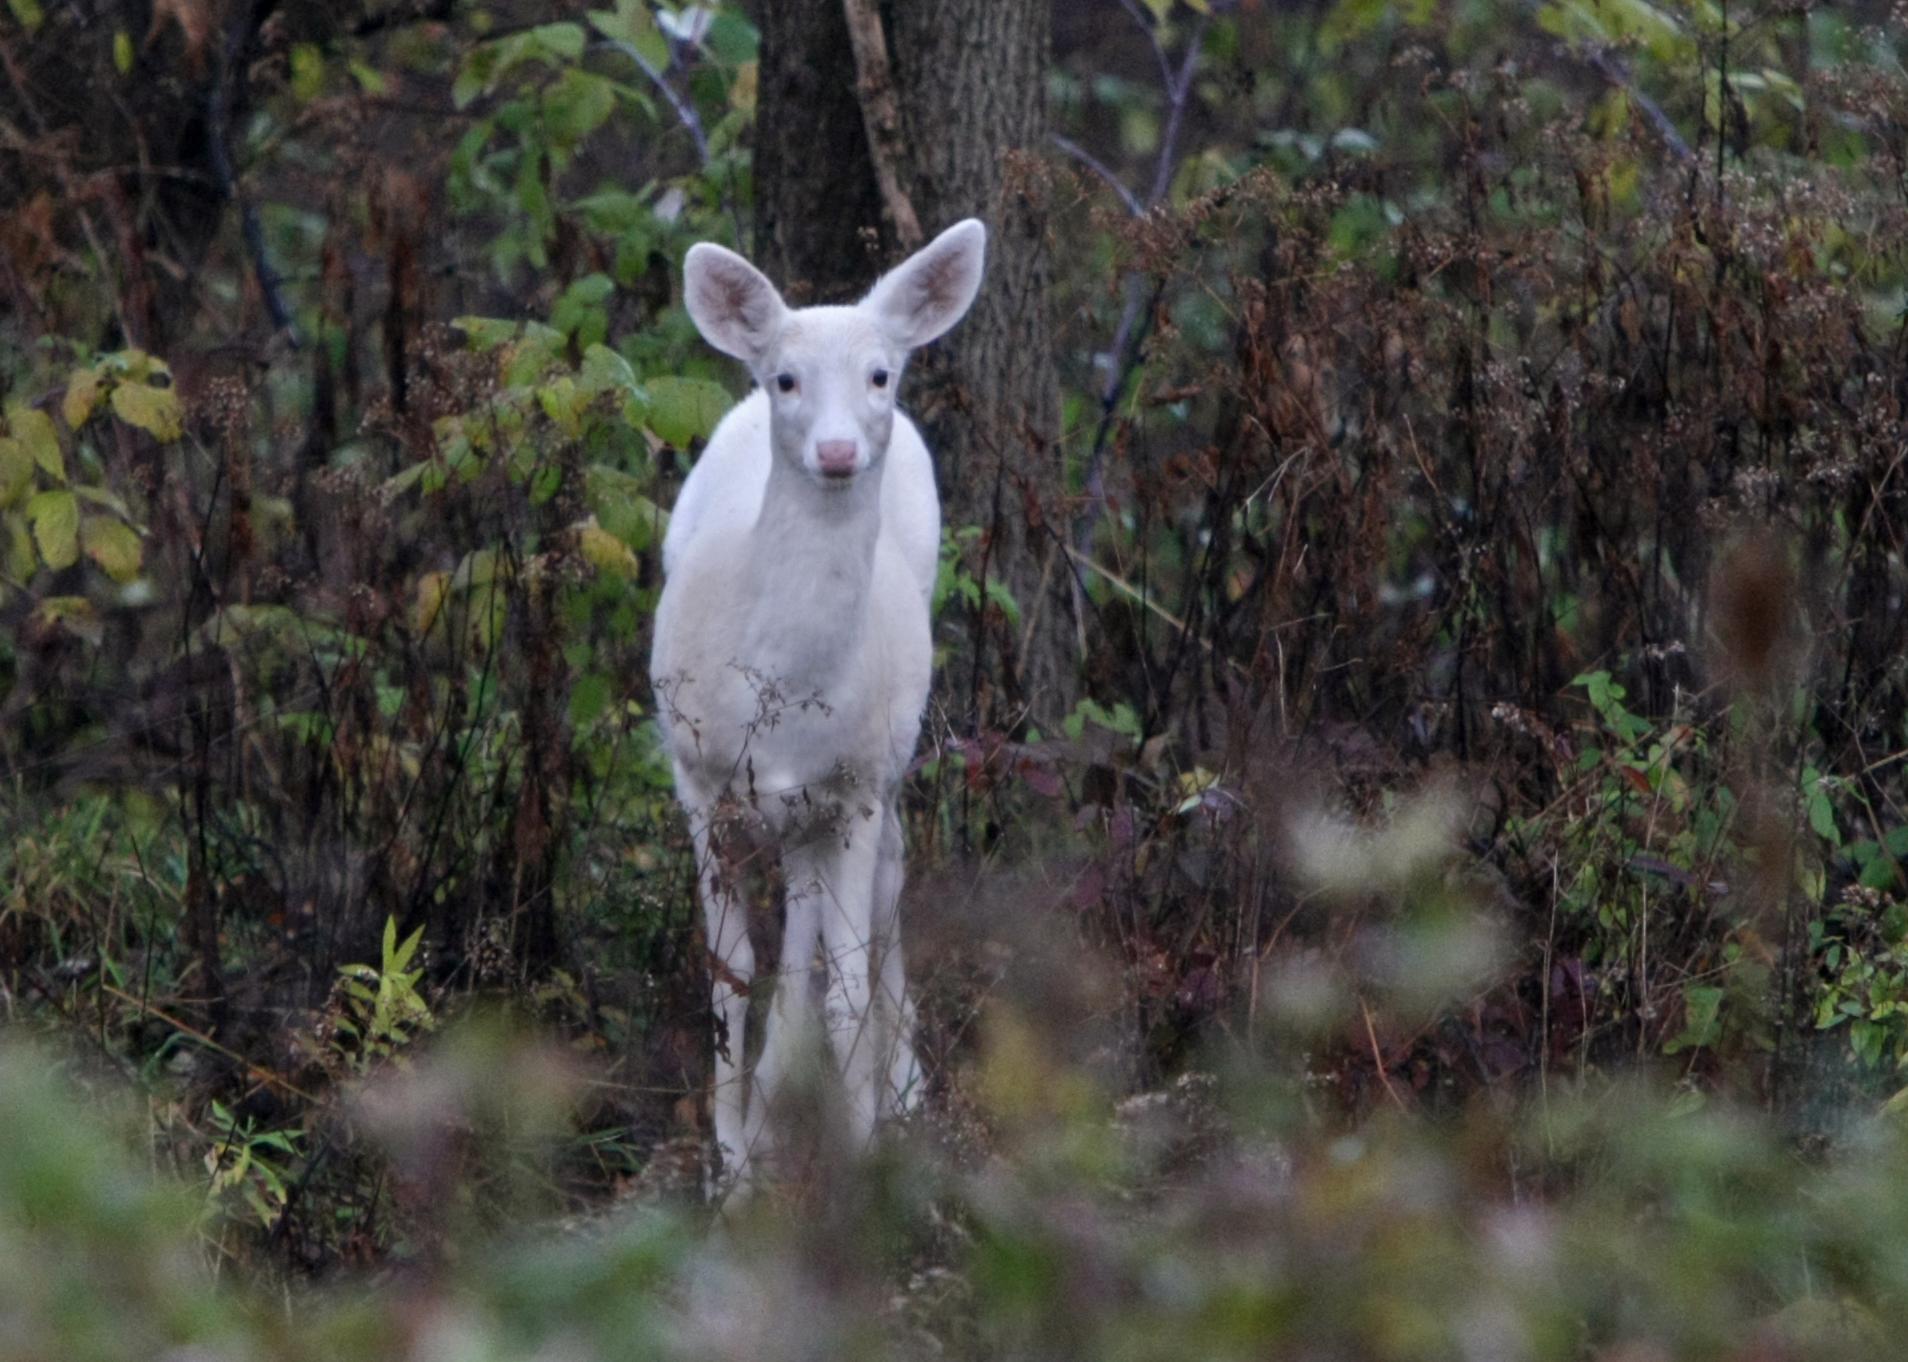 Trail camera close ups White deer turkeys on former Seneca Army